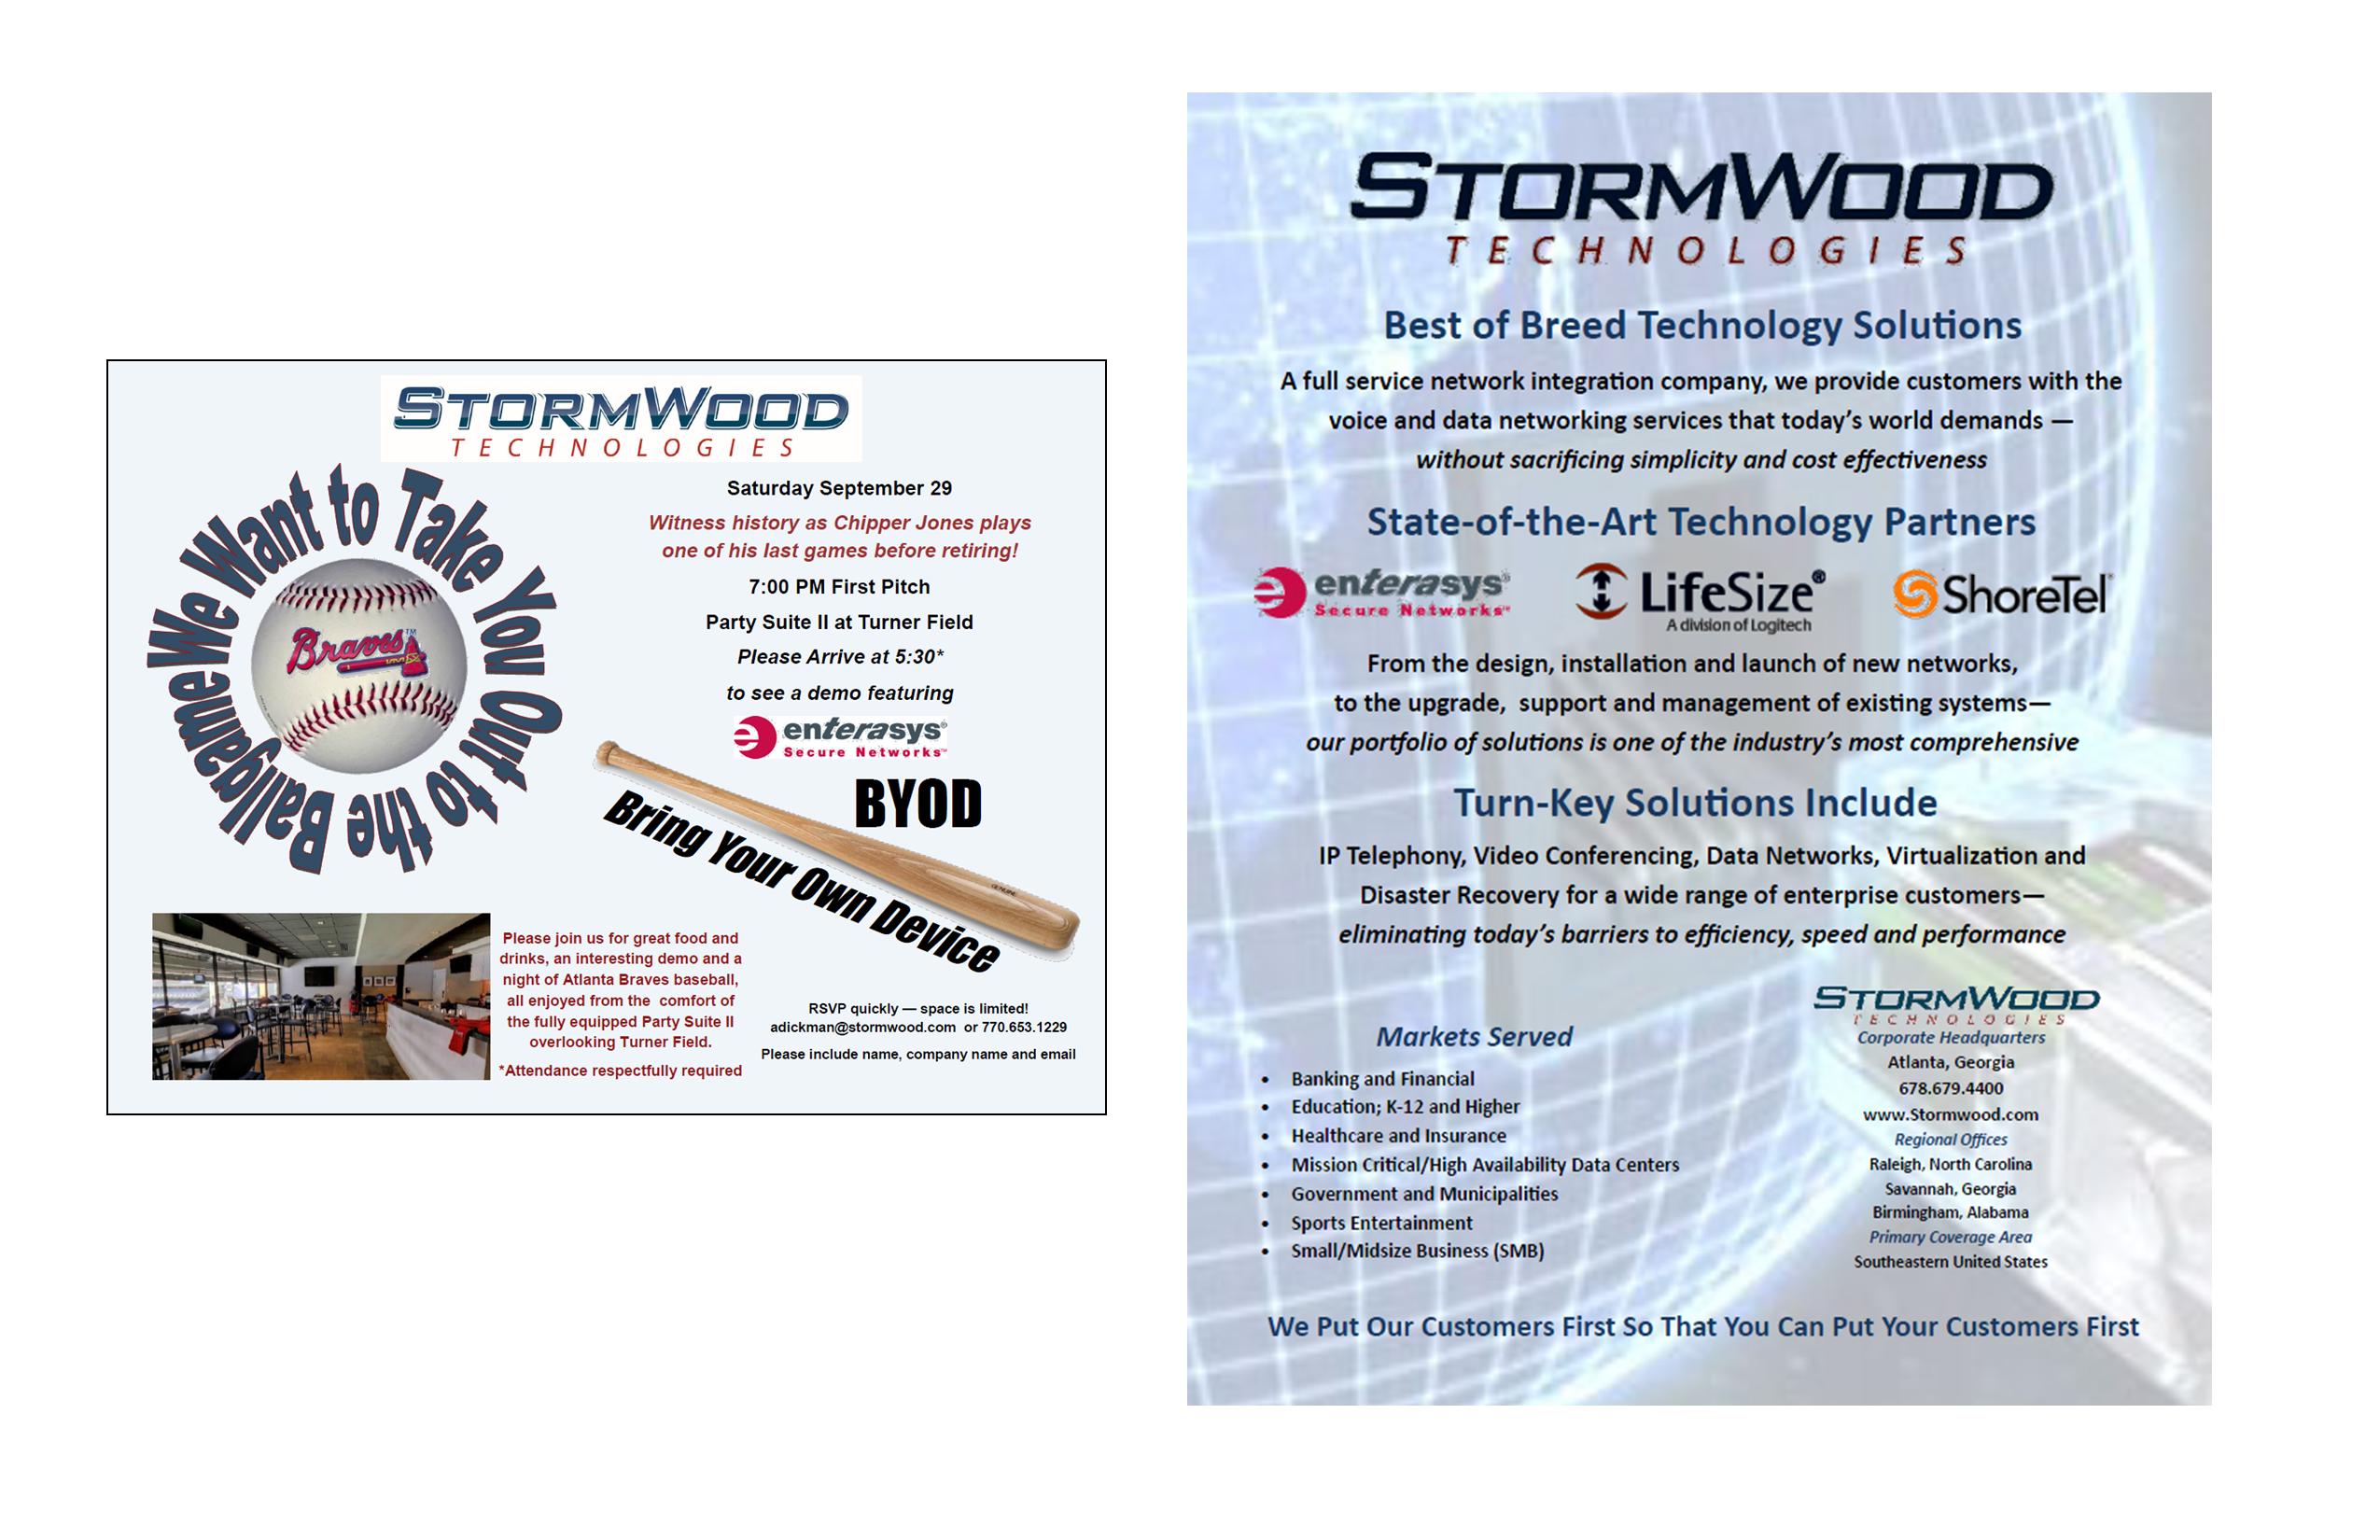 Stormwood Technologies